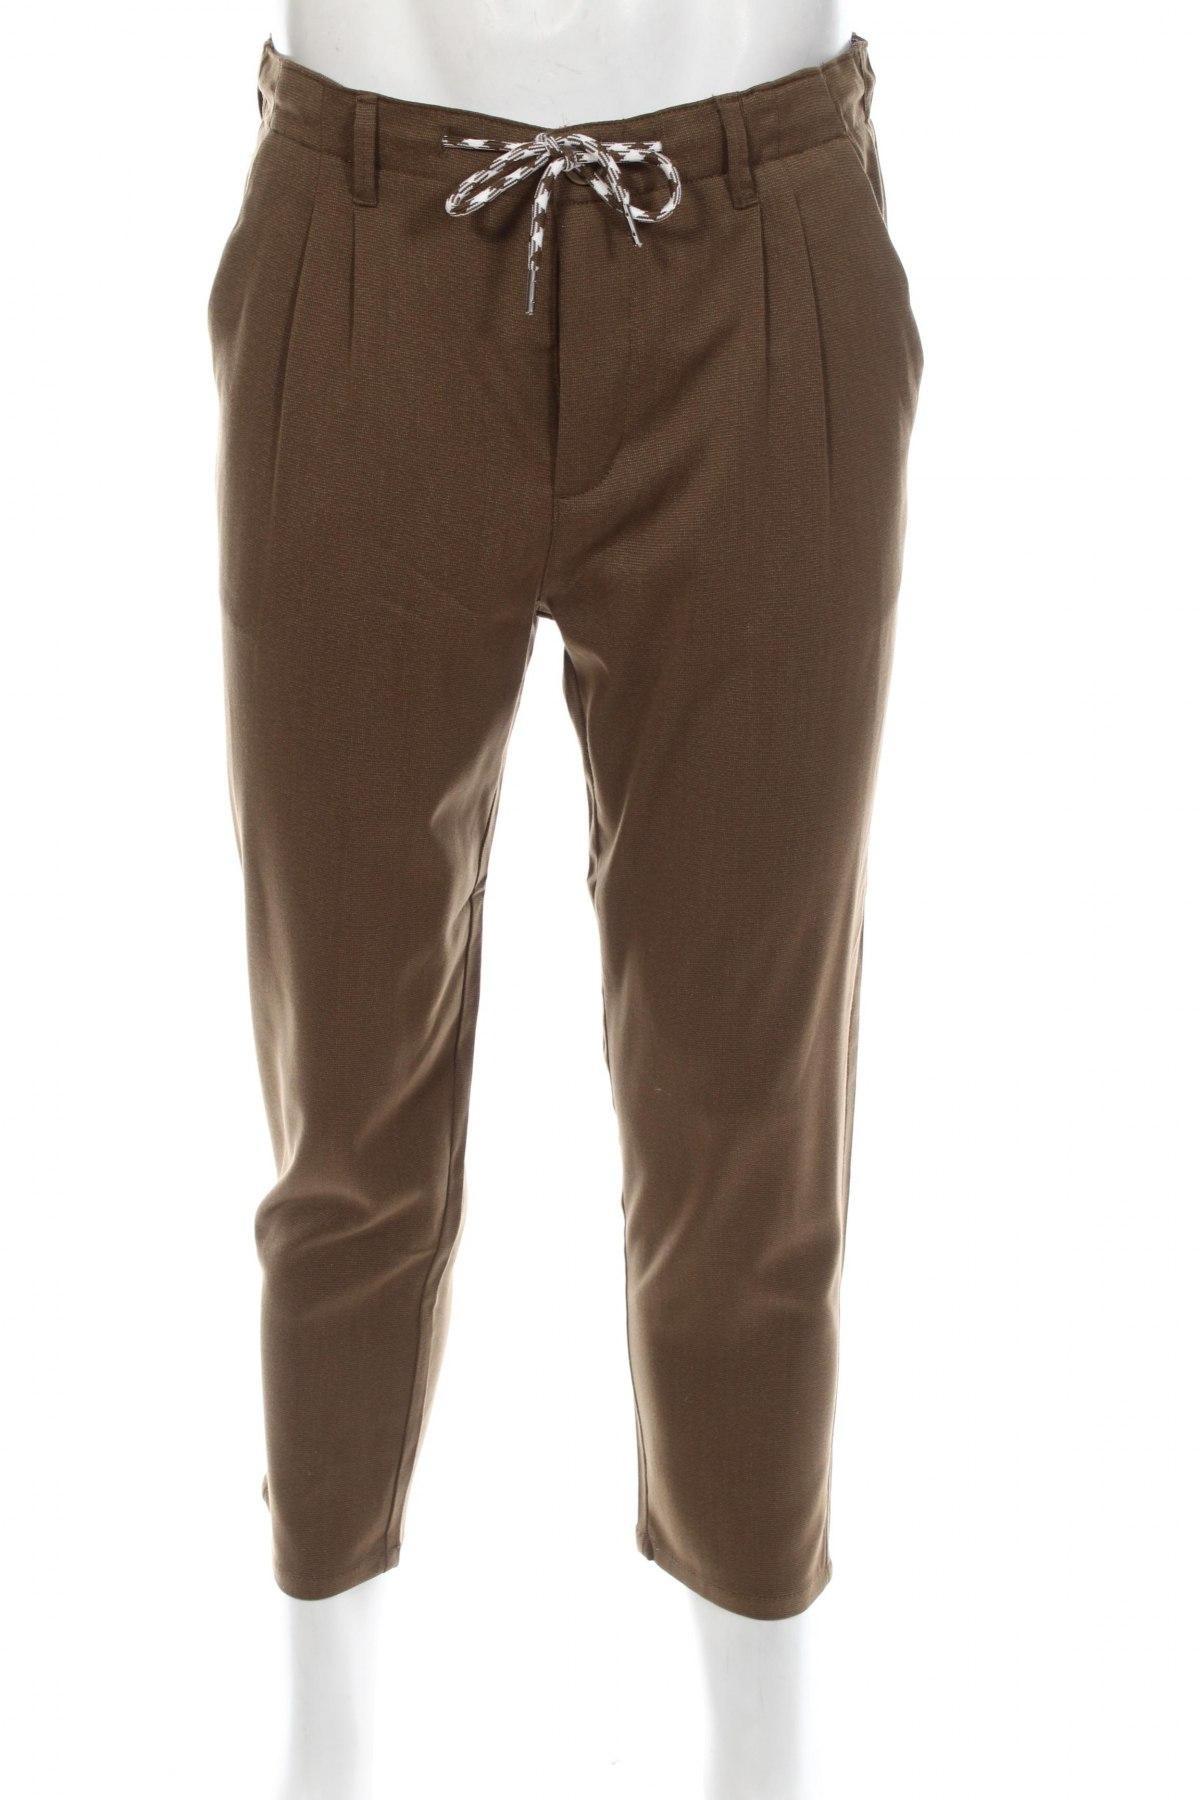 Мъжки панталон Jack & Jones, Размер M, Цвят Кафяв, 71% полиестер, 27% вискоза, 2% еластан, Цена 50,70лв.